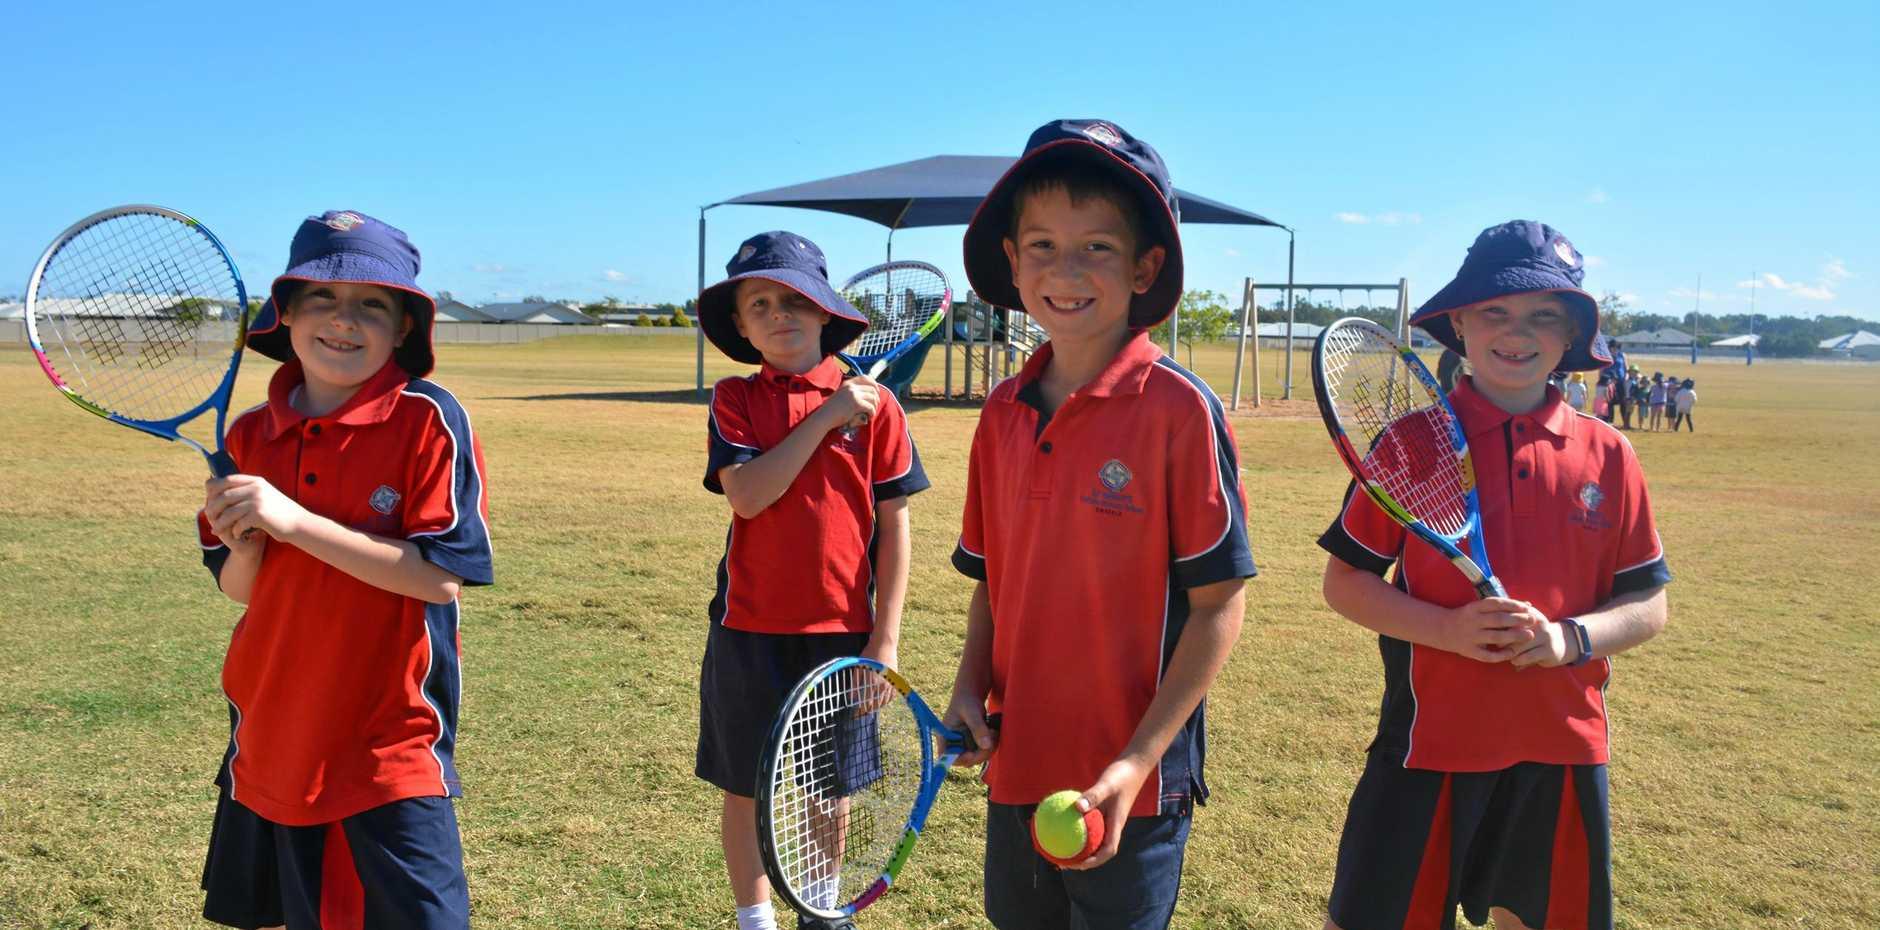 ON FIRE: Safiya Higgins, Aiden Midgely, Flynn Smith and Heidi Edwards trialling their new tennis racquets.